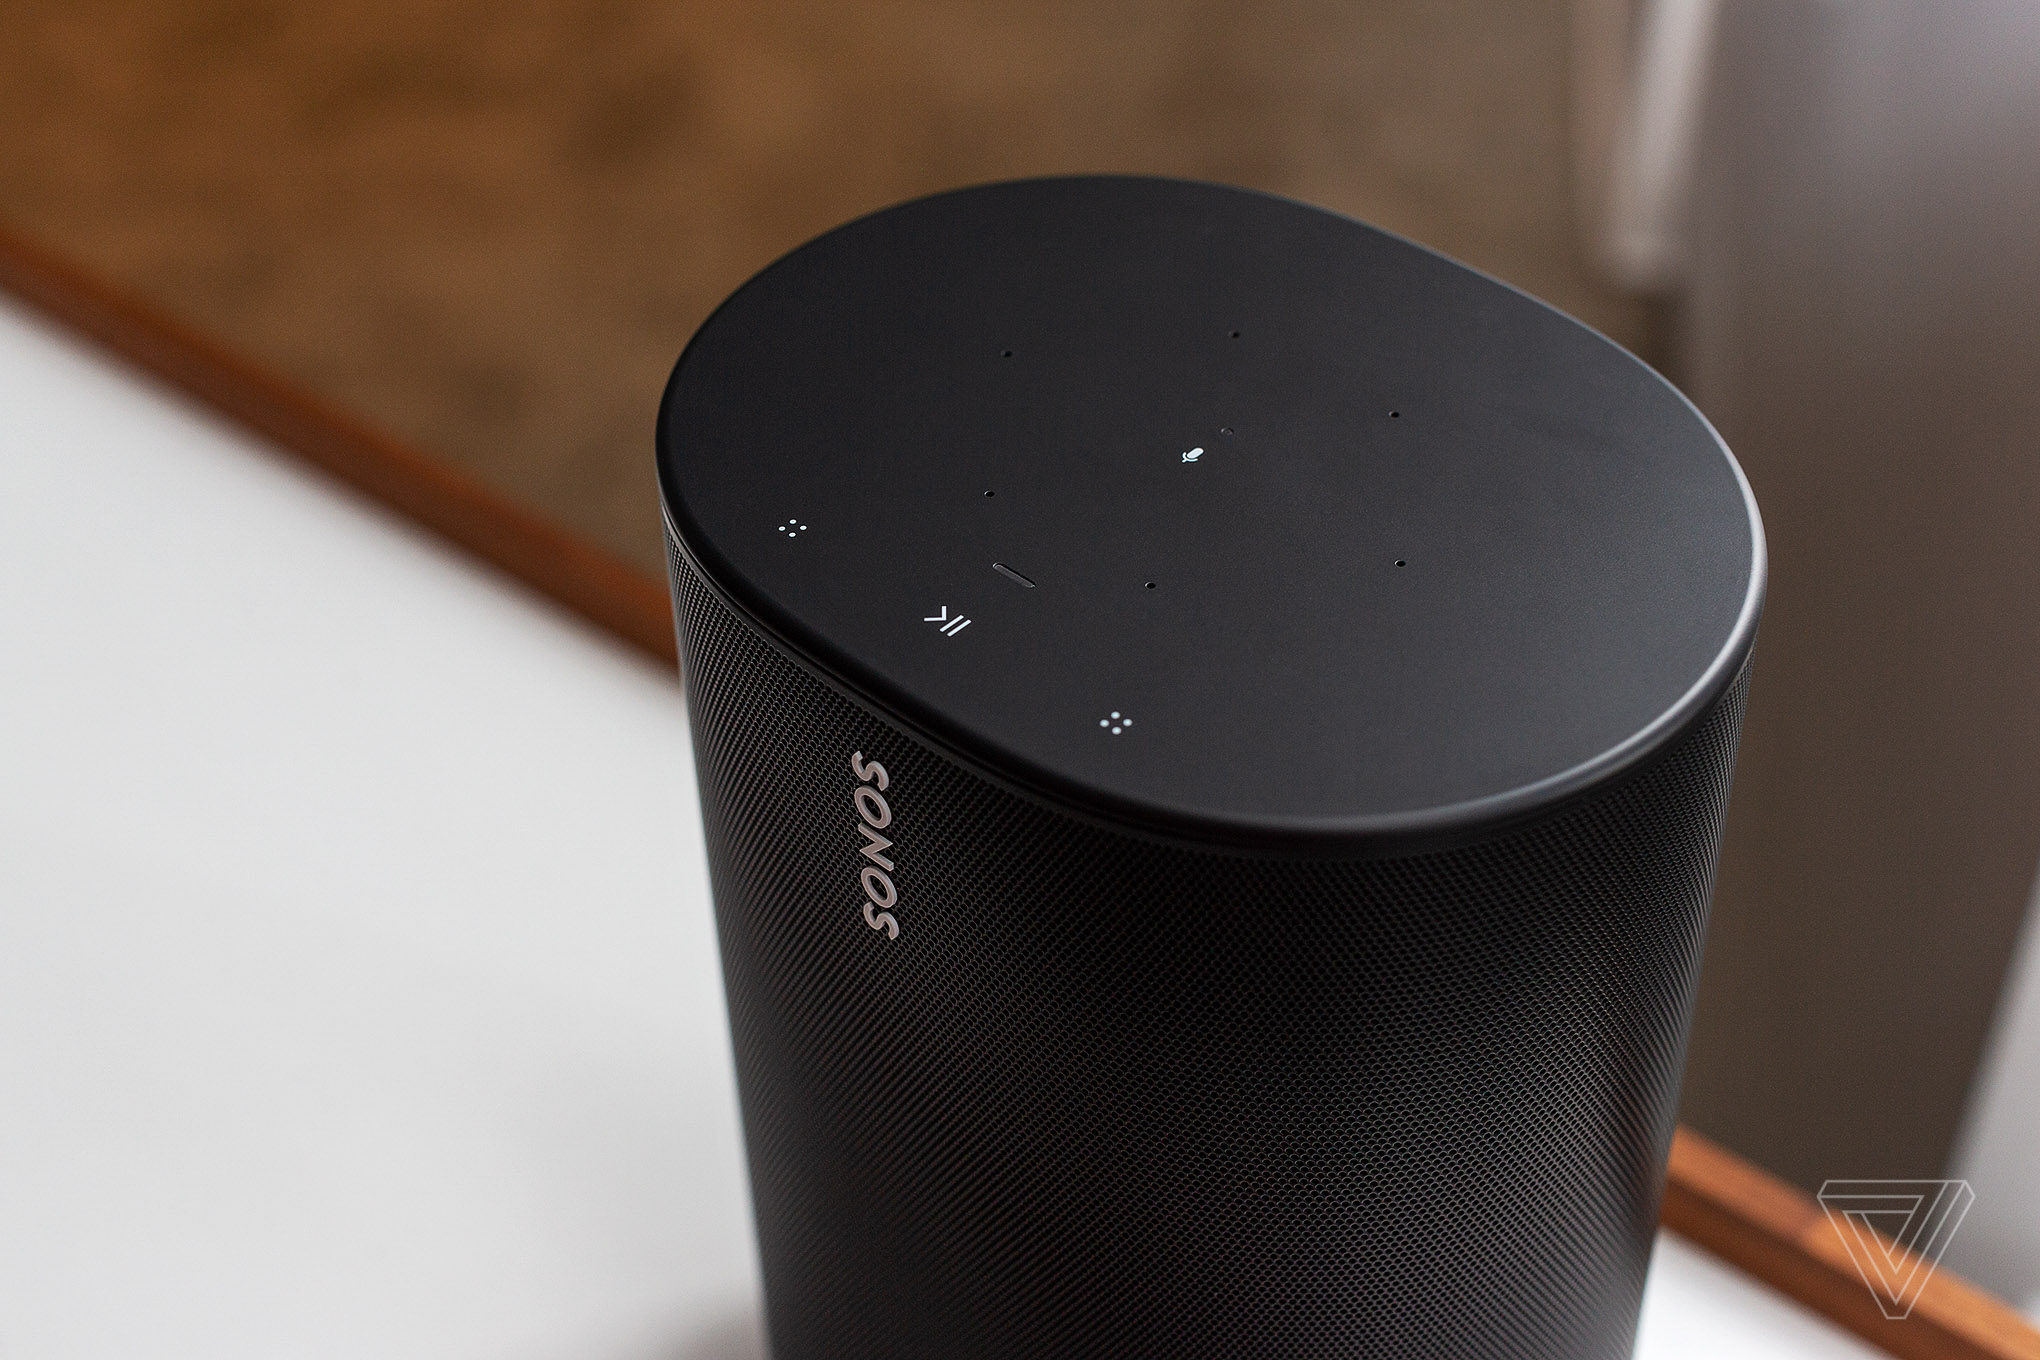 A Sonos Move speaker